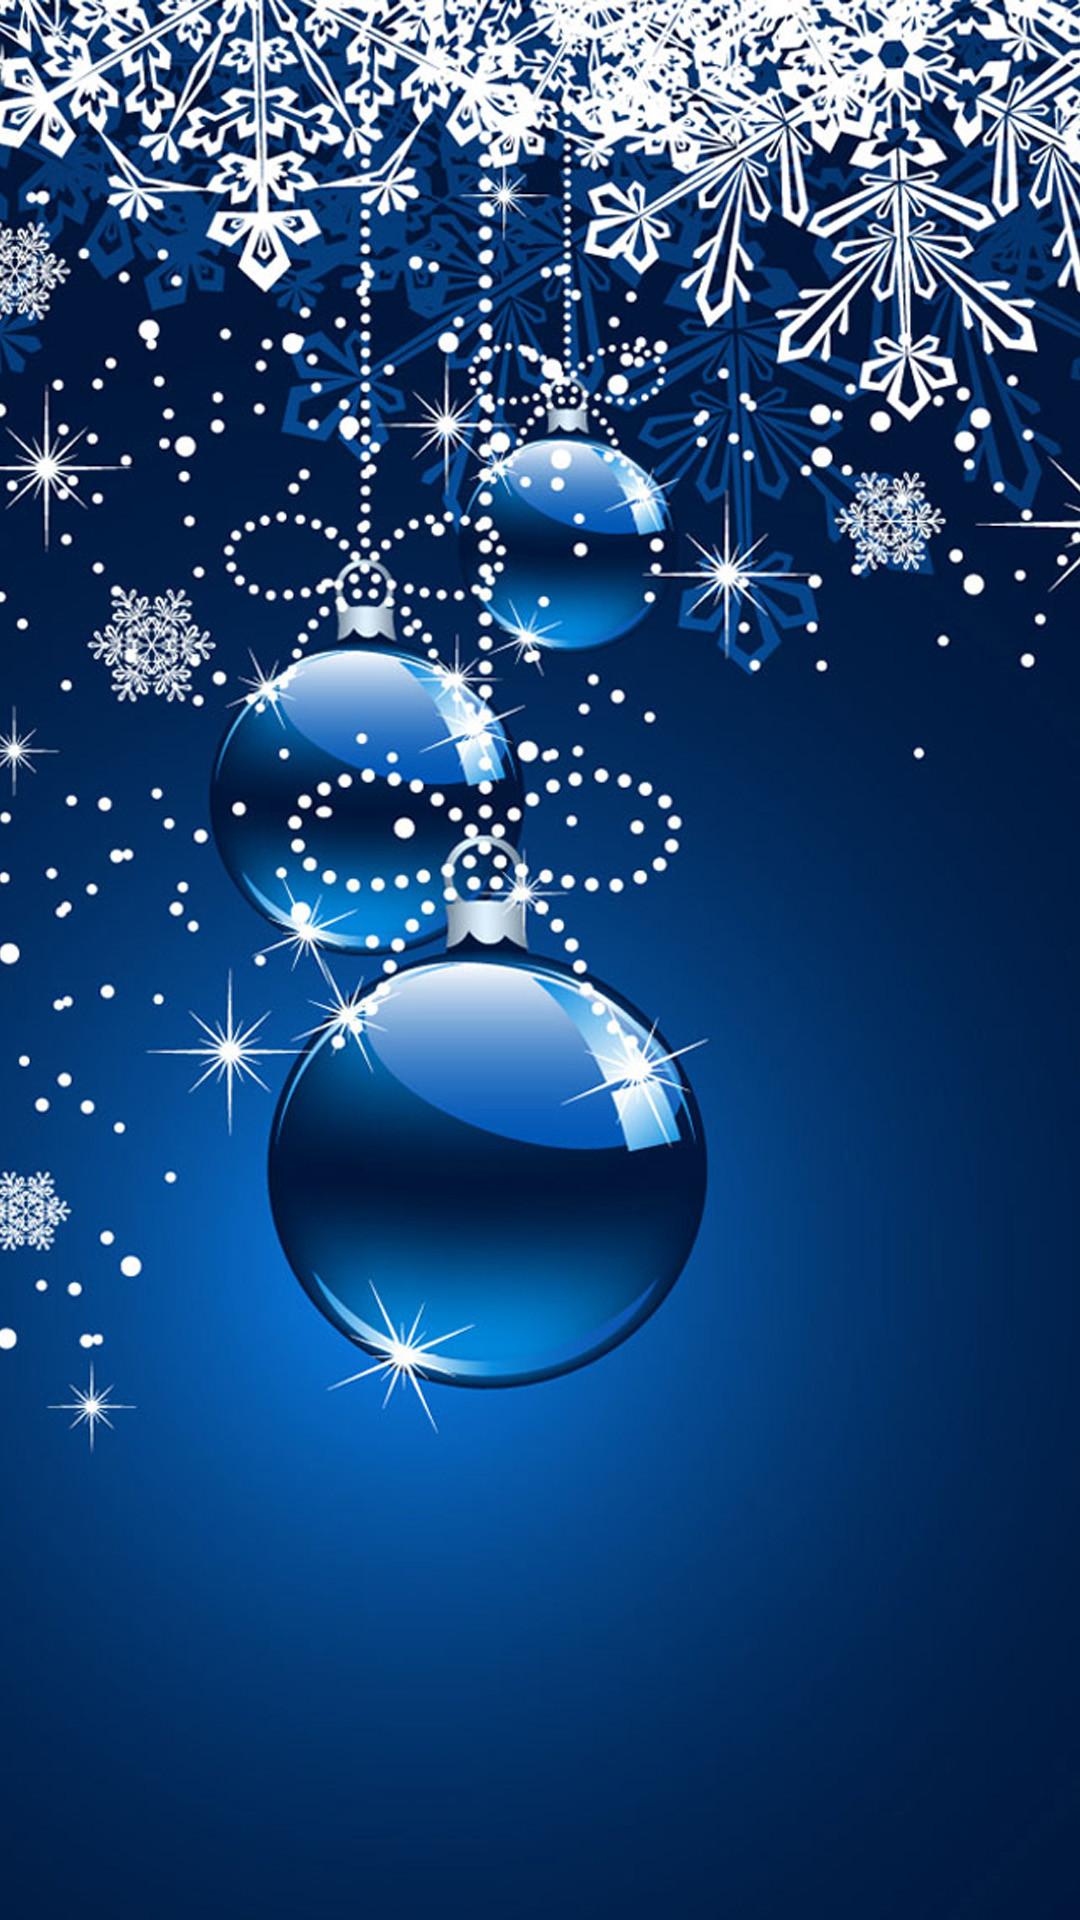 Christmas snowflake iPhone 6 plus wallpaper – balls, floating ornaments –  christmas snowflake iphone 6 plus wallpaper: Christmas themed iPhone 6 plus  …